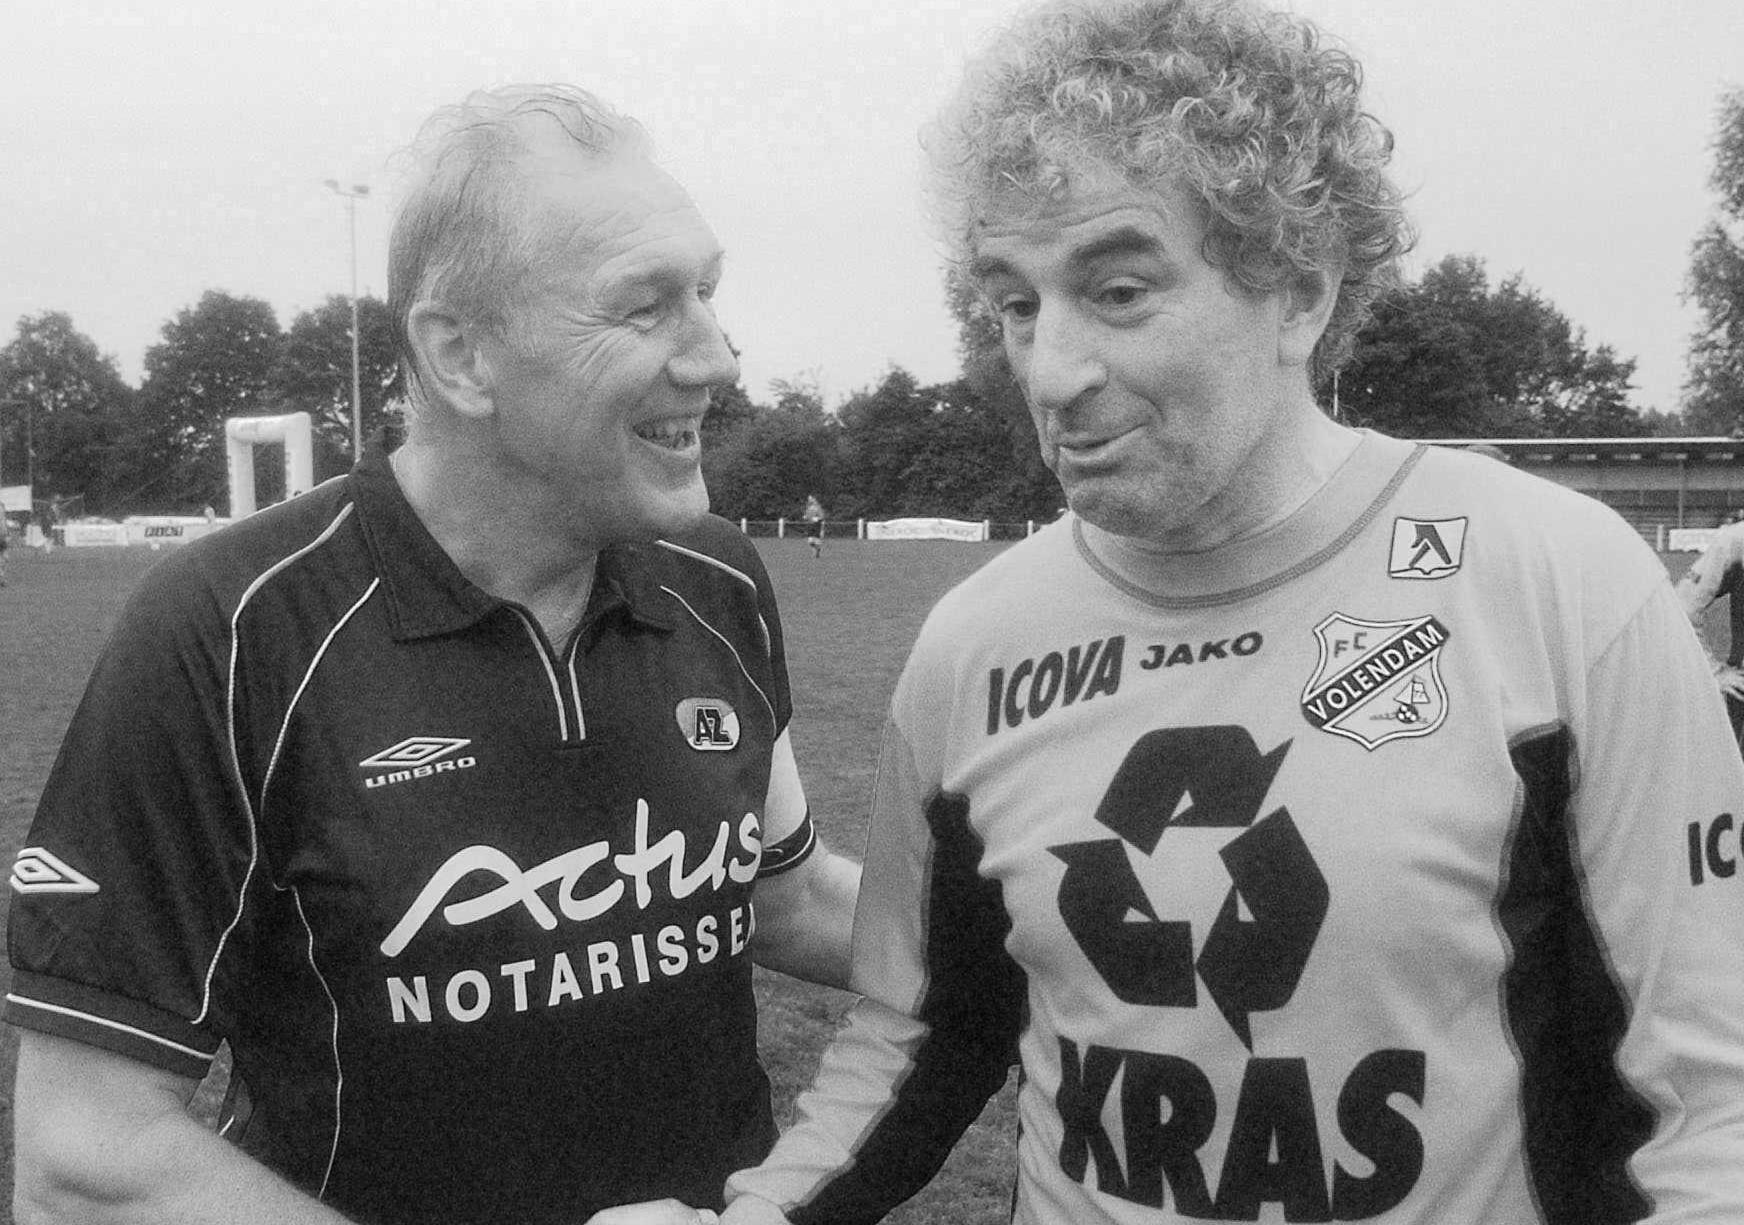 Frank Kramer, tv-presentator en oud-voetballer van FC Volendam, Haarlem en Telstar, overleden [video]